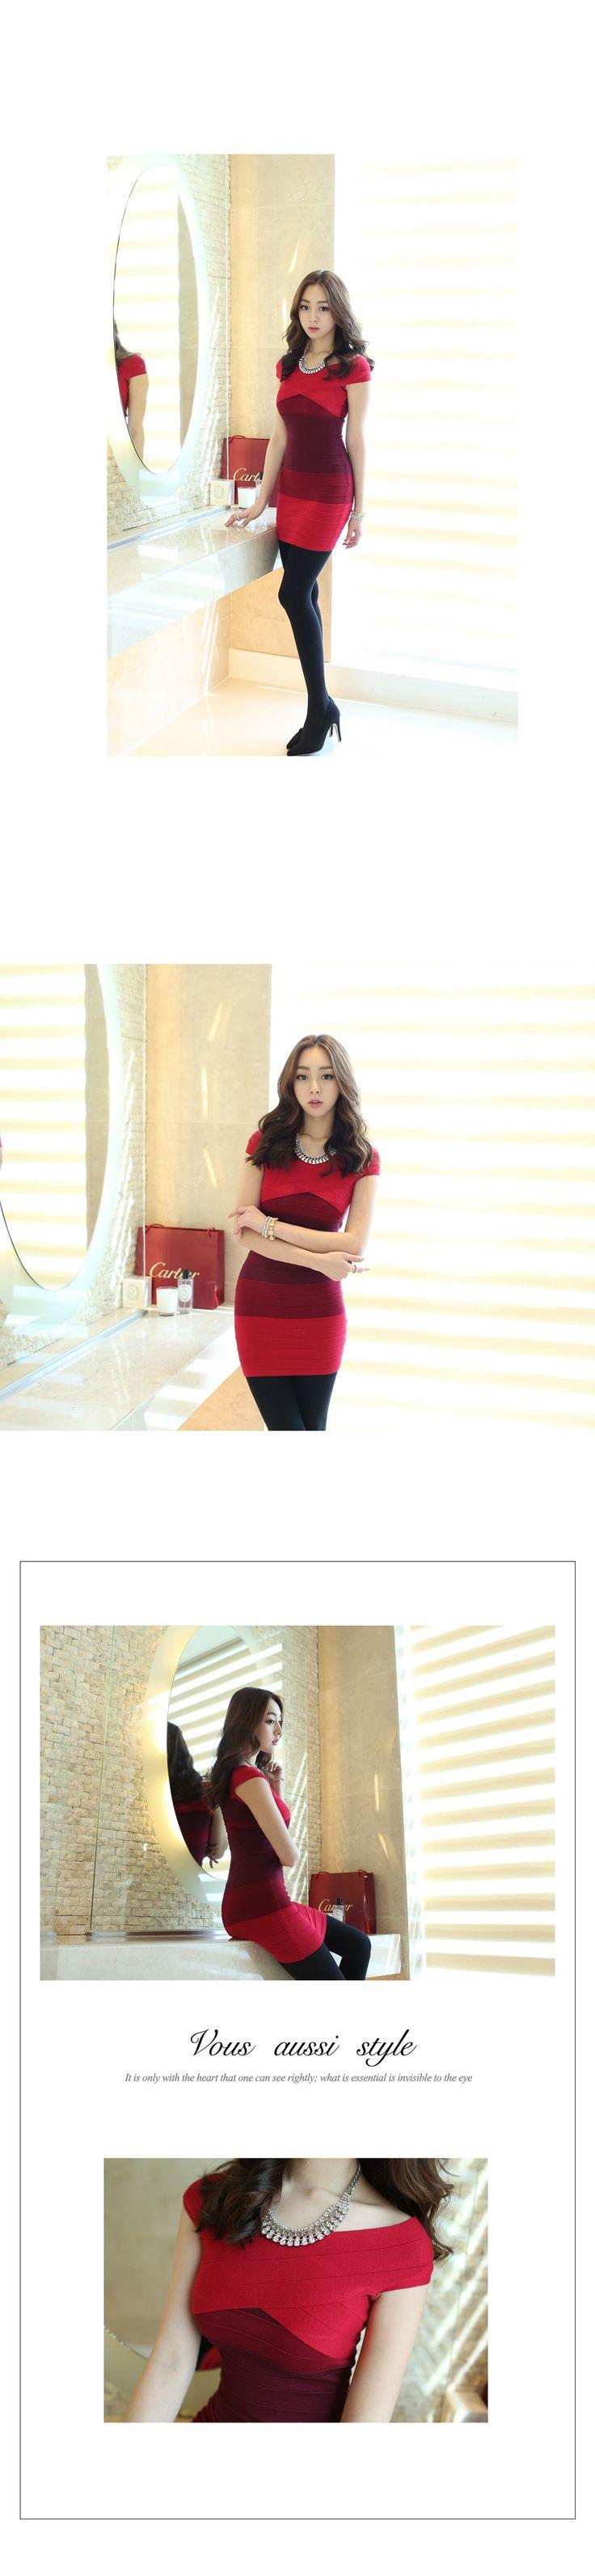 Dress berbahan elastis yang melekat di tubuh. Paduan beragam warna merah kuat yang chic dan modern. Juga tersedai dalam warna abu-abu yang bagus dipadankan dengan warna apapun. http://www.koreabuys.com/product/product_view.html?seq=18547